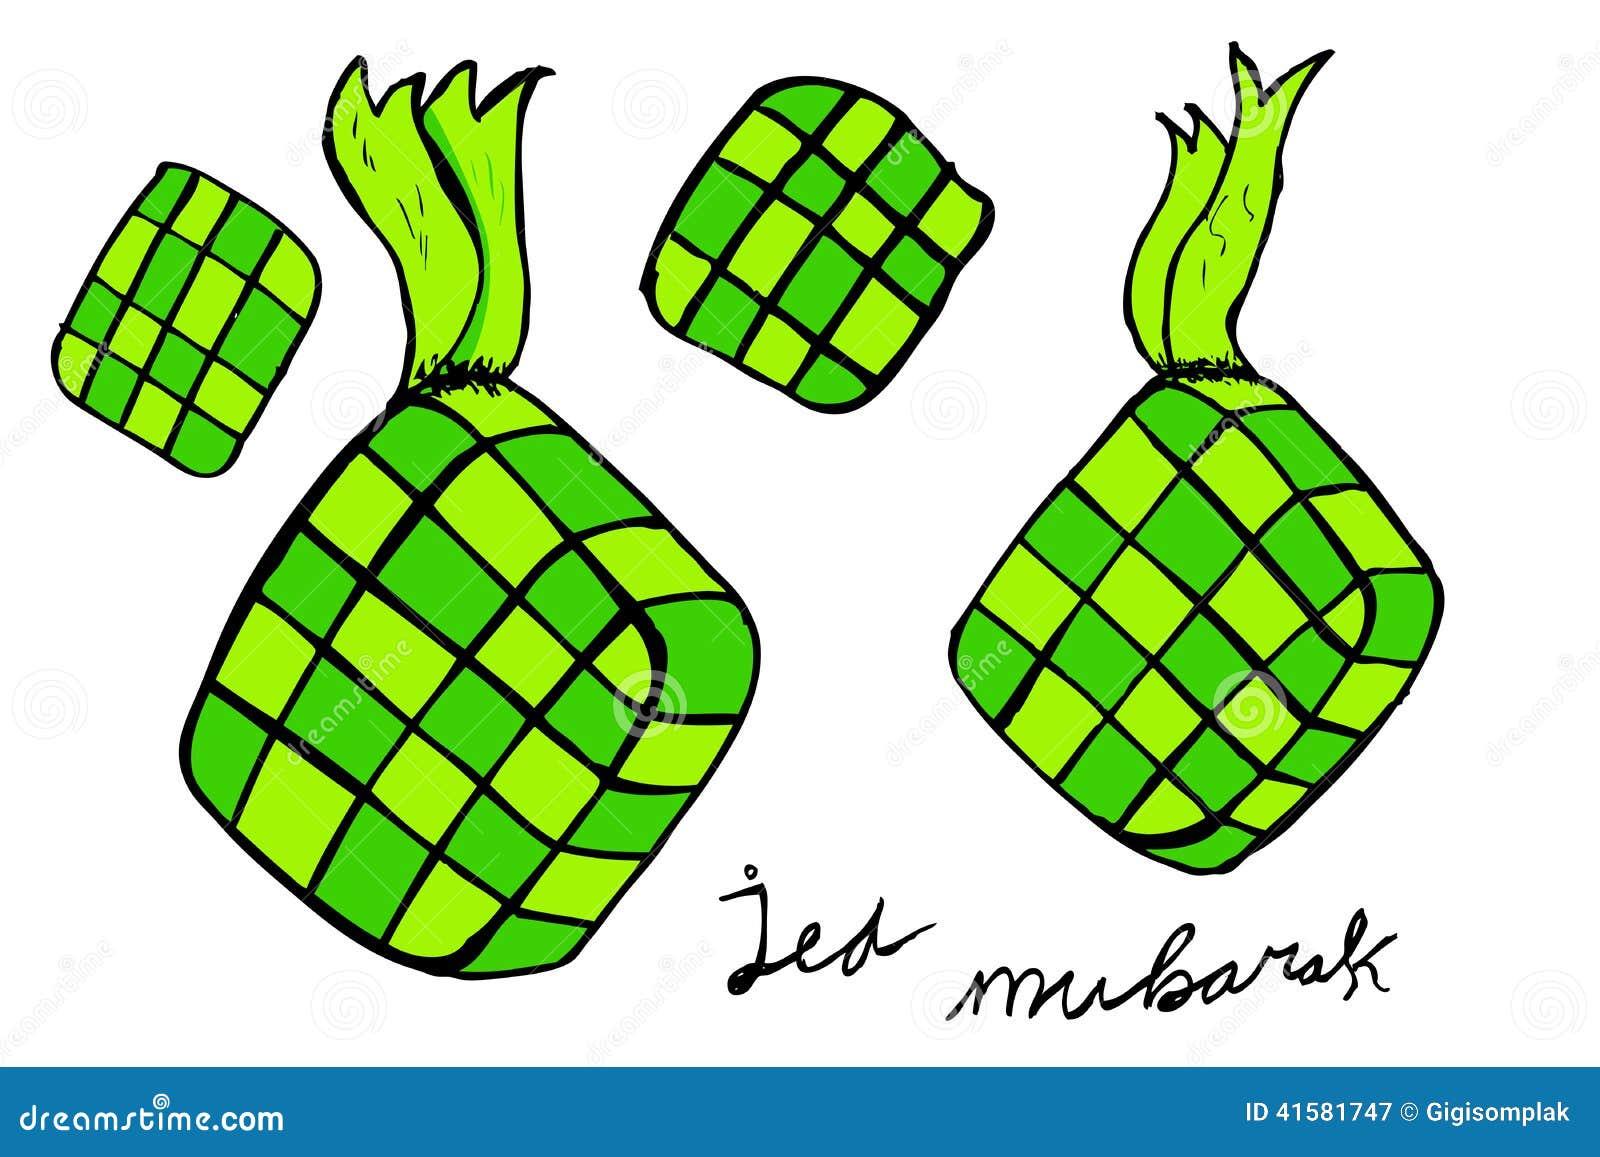 Ketupat Indonesia Traditional Food Isolated Yellow Dumpling Vector Graphic Raya